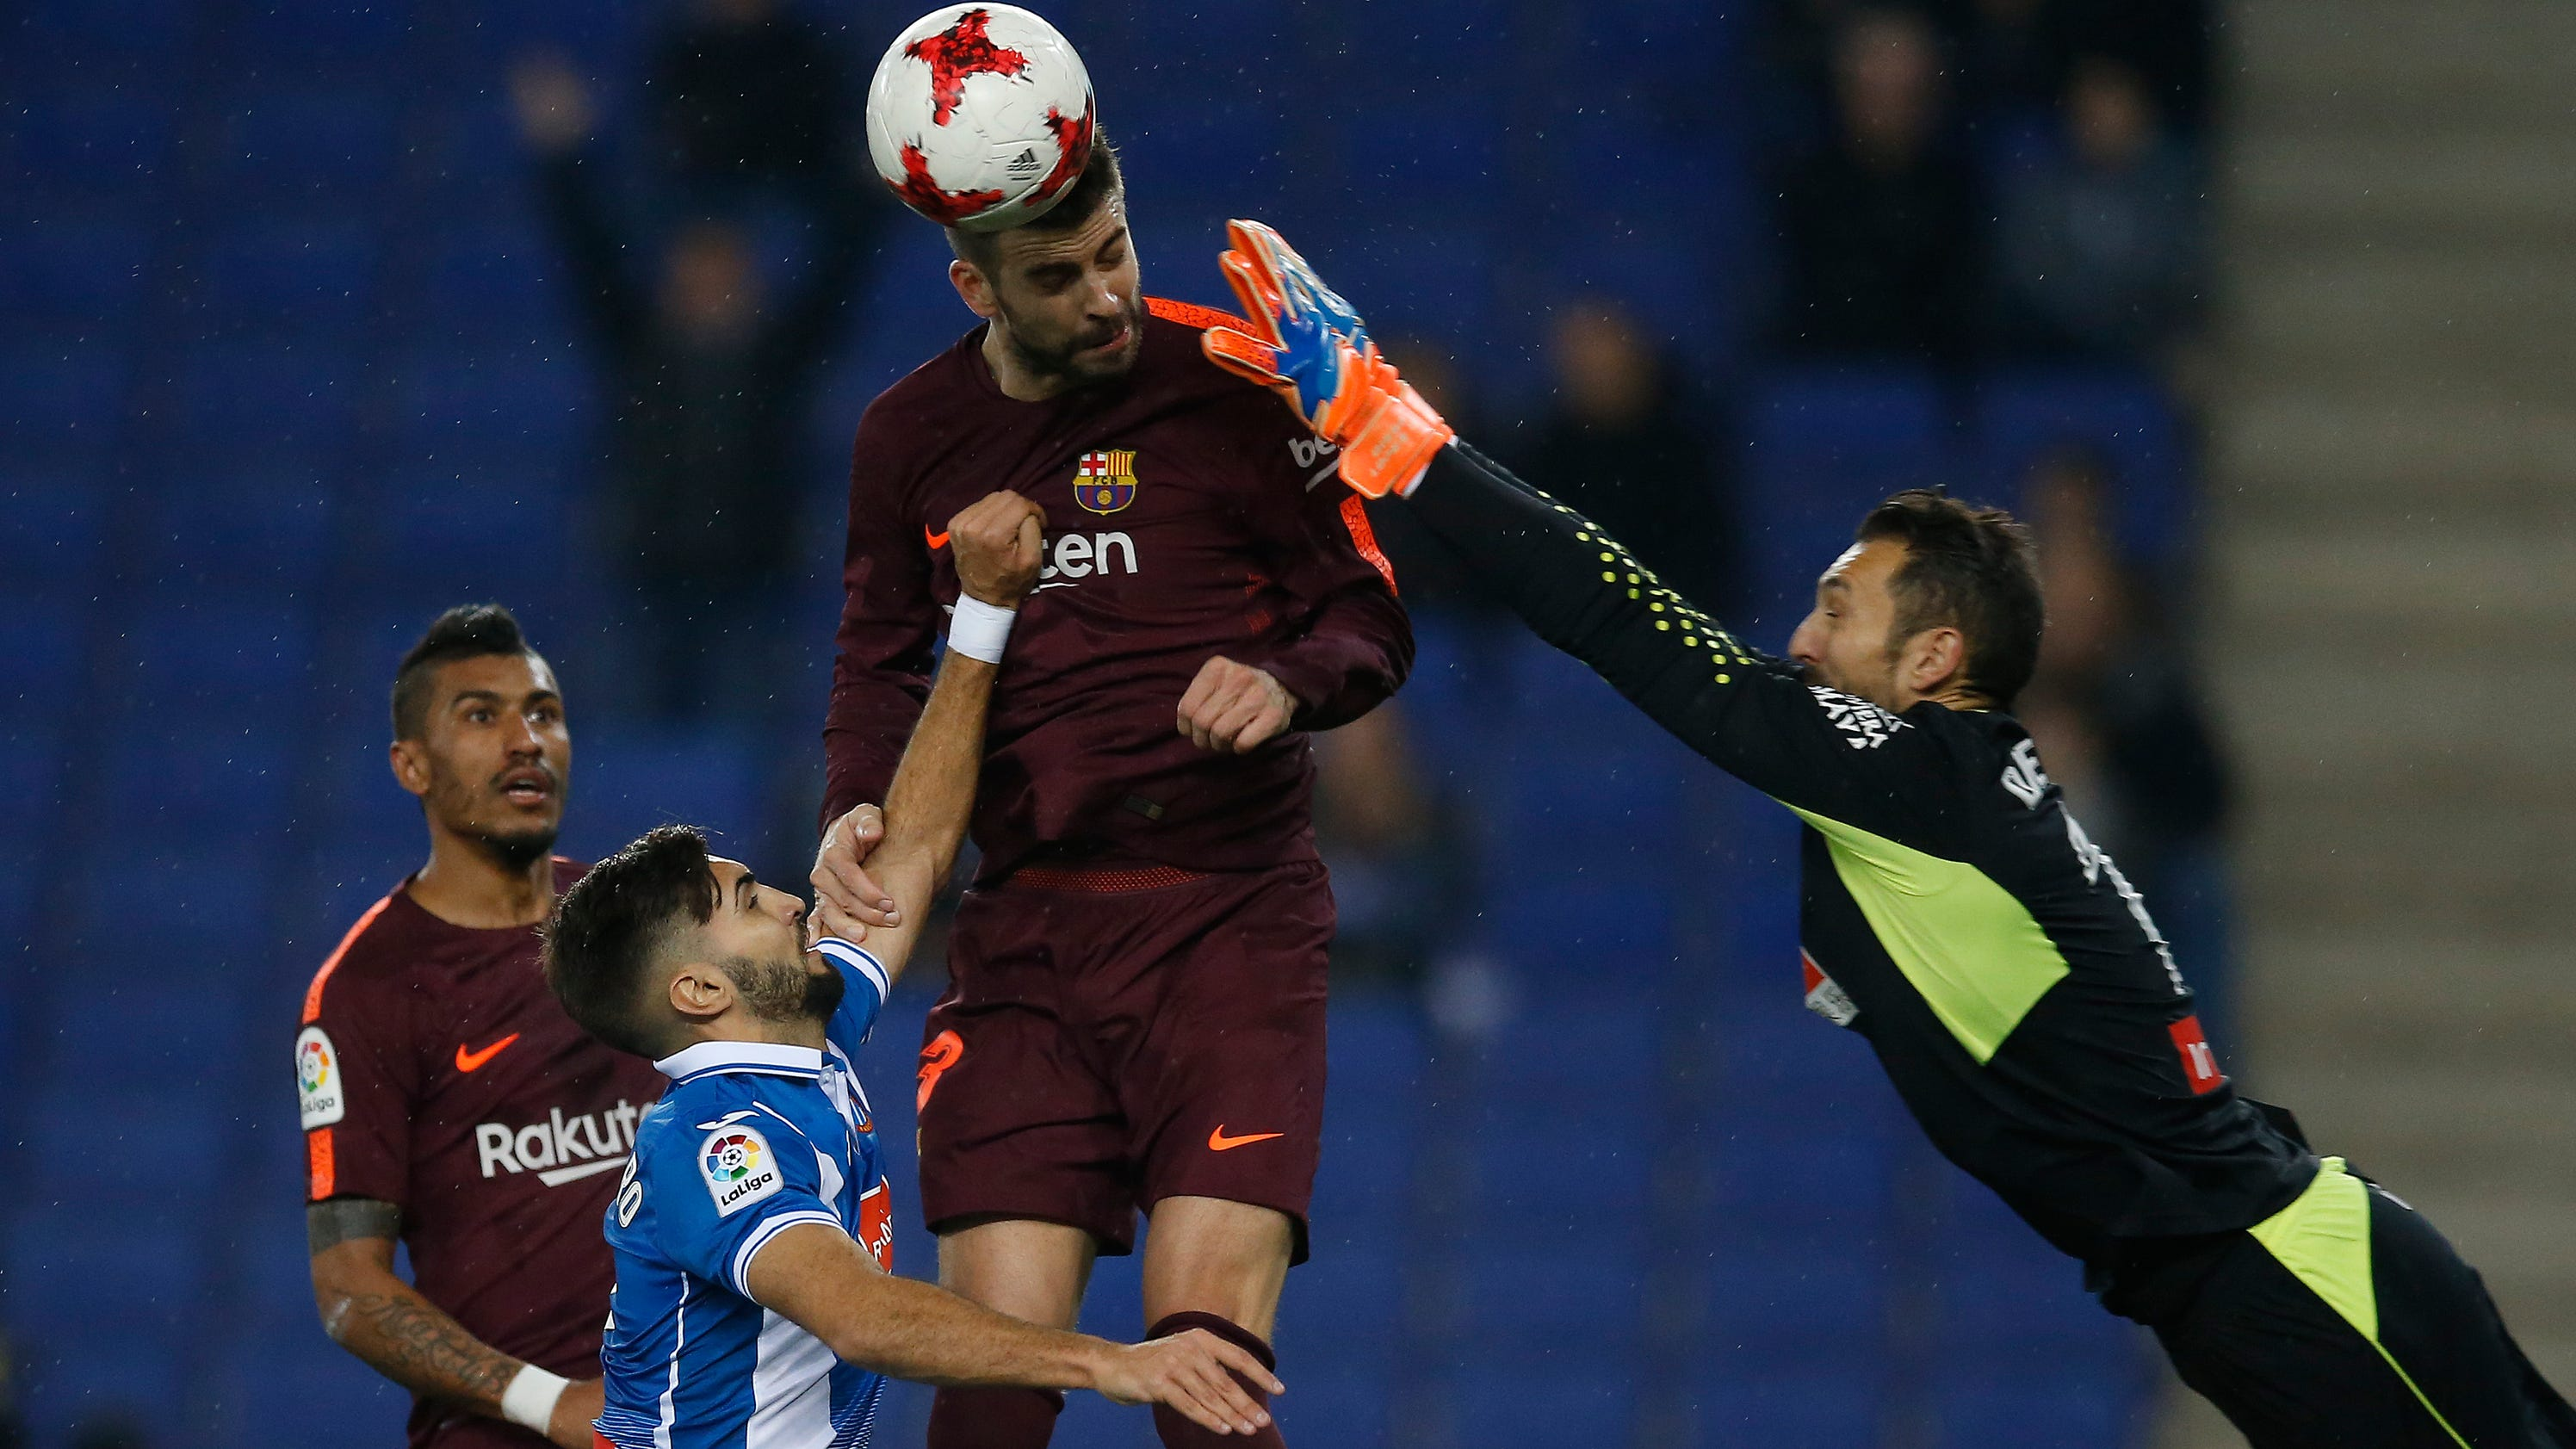 Messi misses penalty barcelona 39 s 29 game unbeaten run ends - Firefly barcelona ...